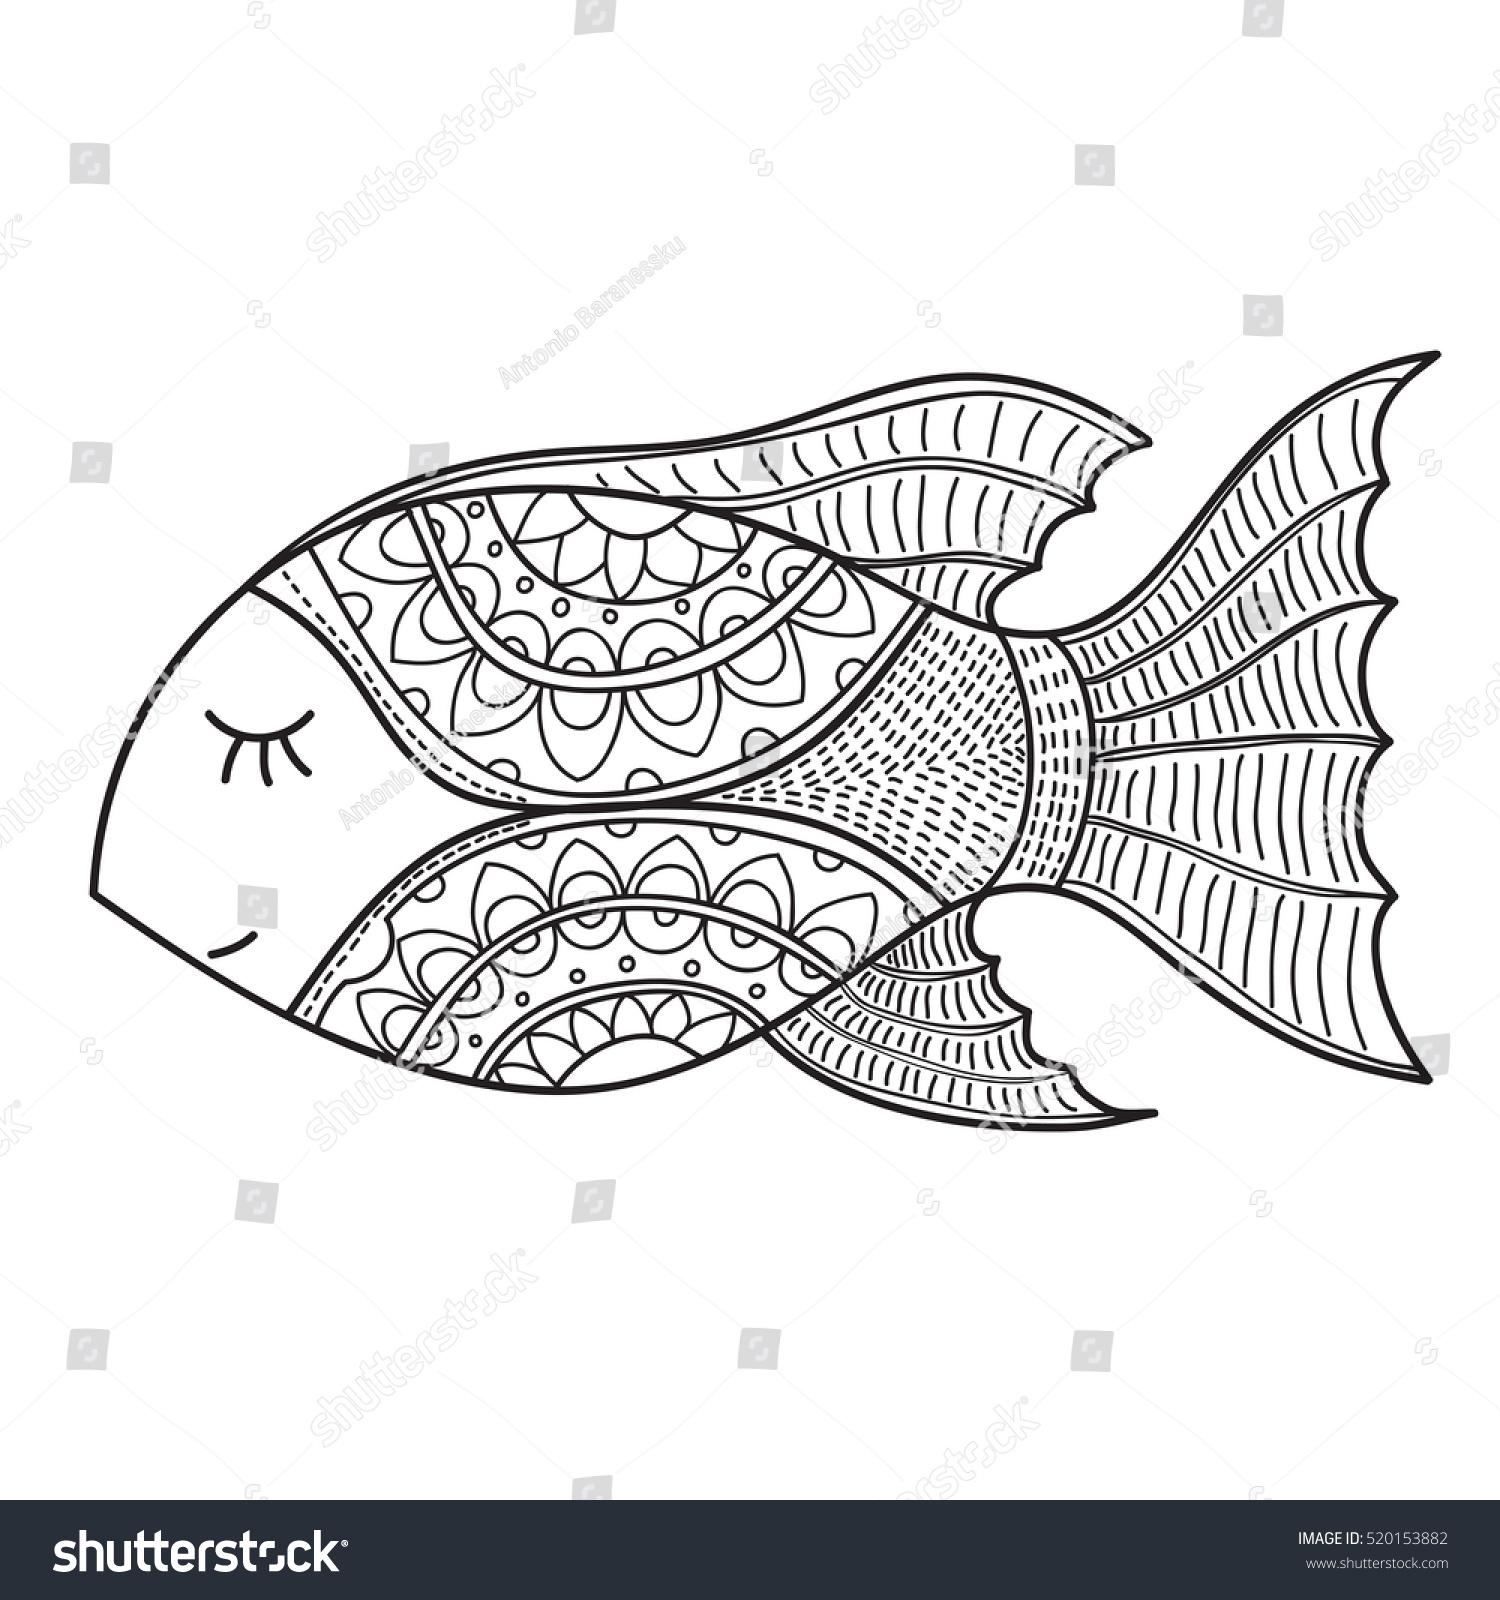 decorative fish drawing abstract ornaments hand stock vector